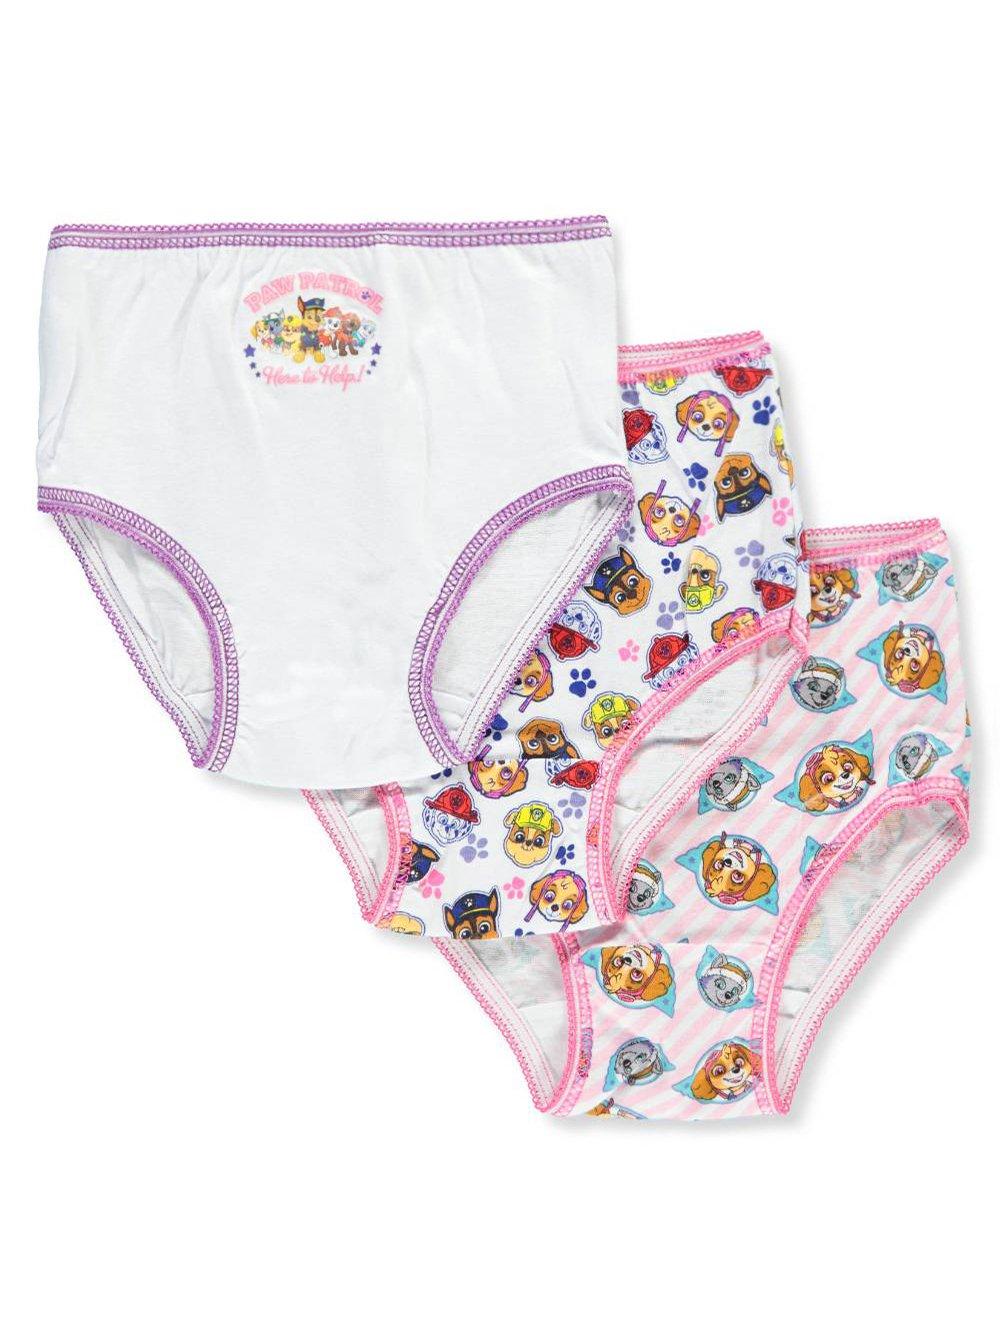 Nickelodeon Paw Patrol Toddler Girl's 3 Pack Girls Underwear Panties